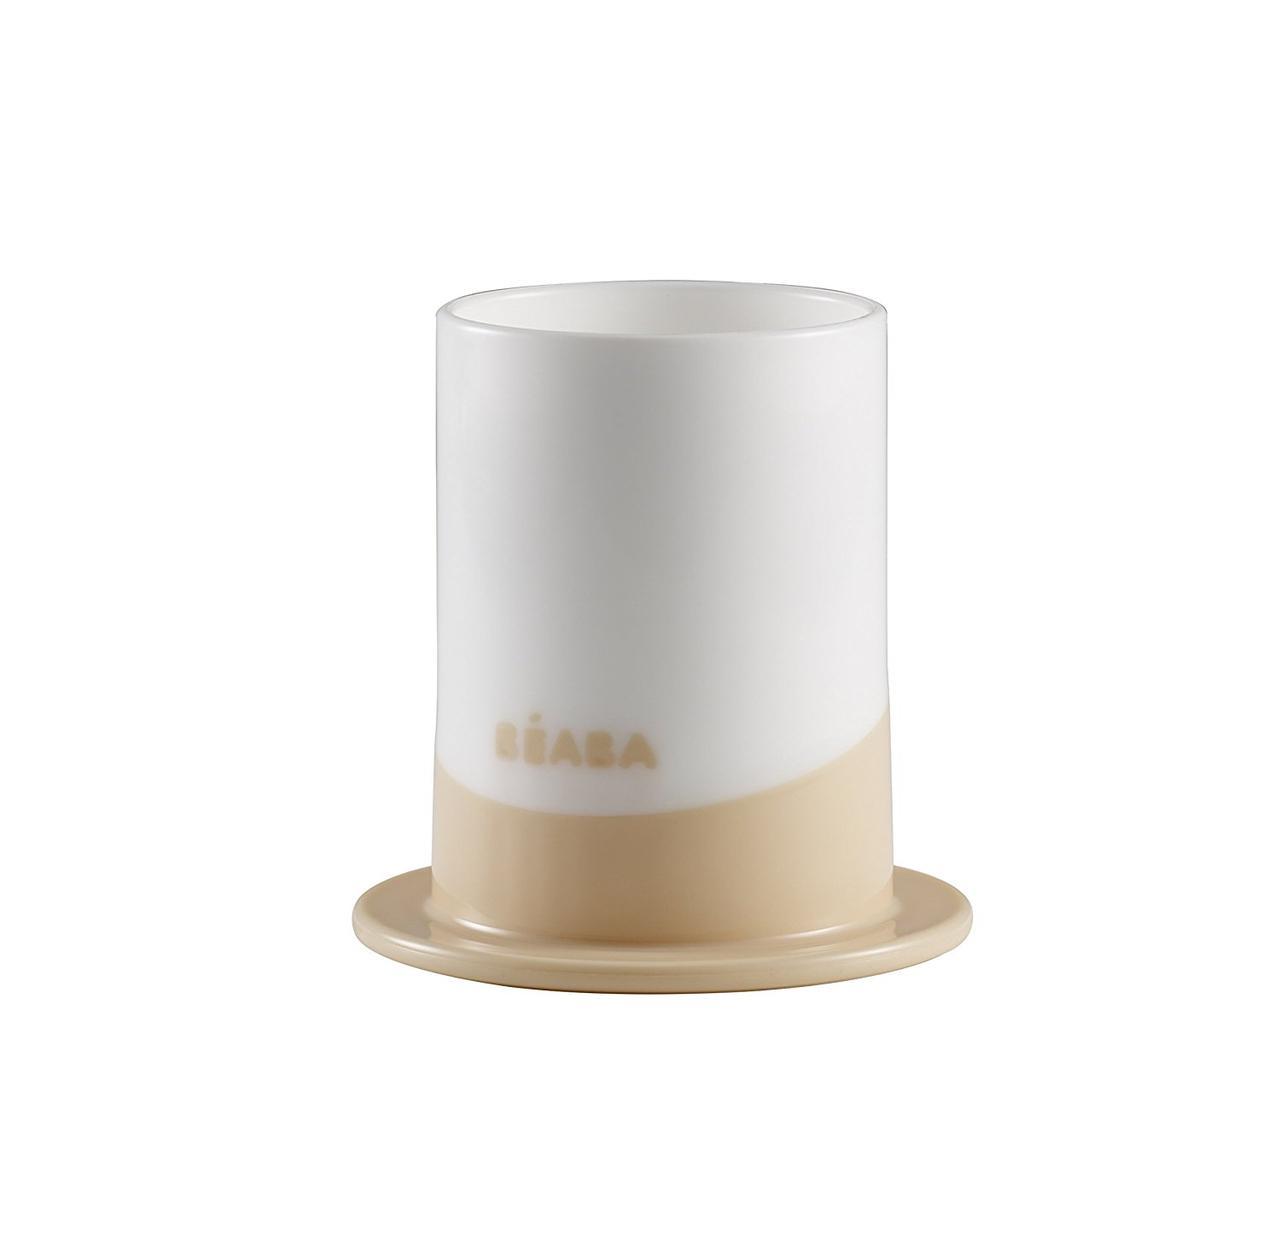 Пластиковый стакан Beaba Ellipse Glass nude, арт. 913389